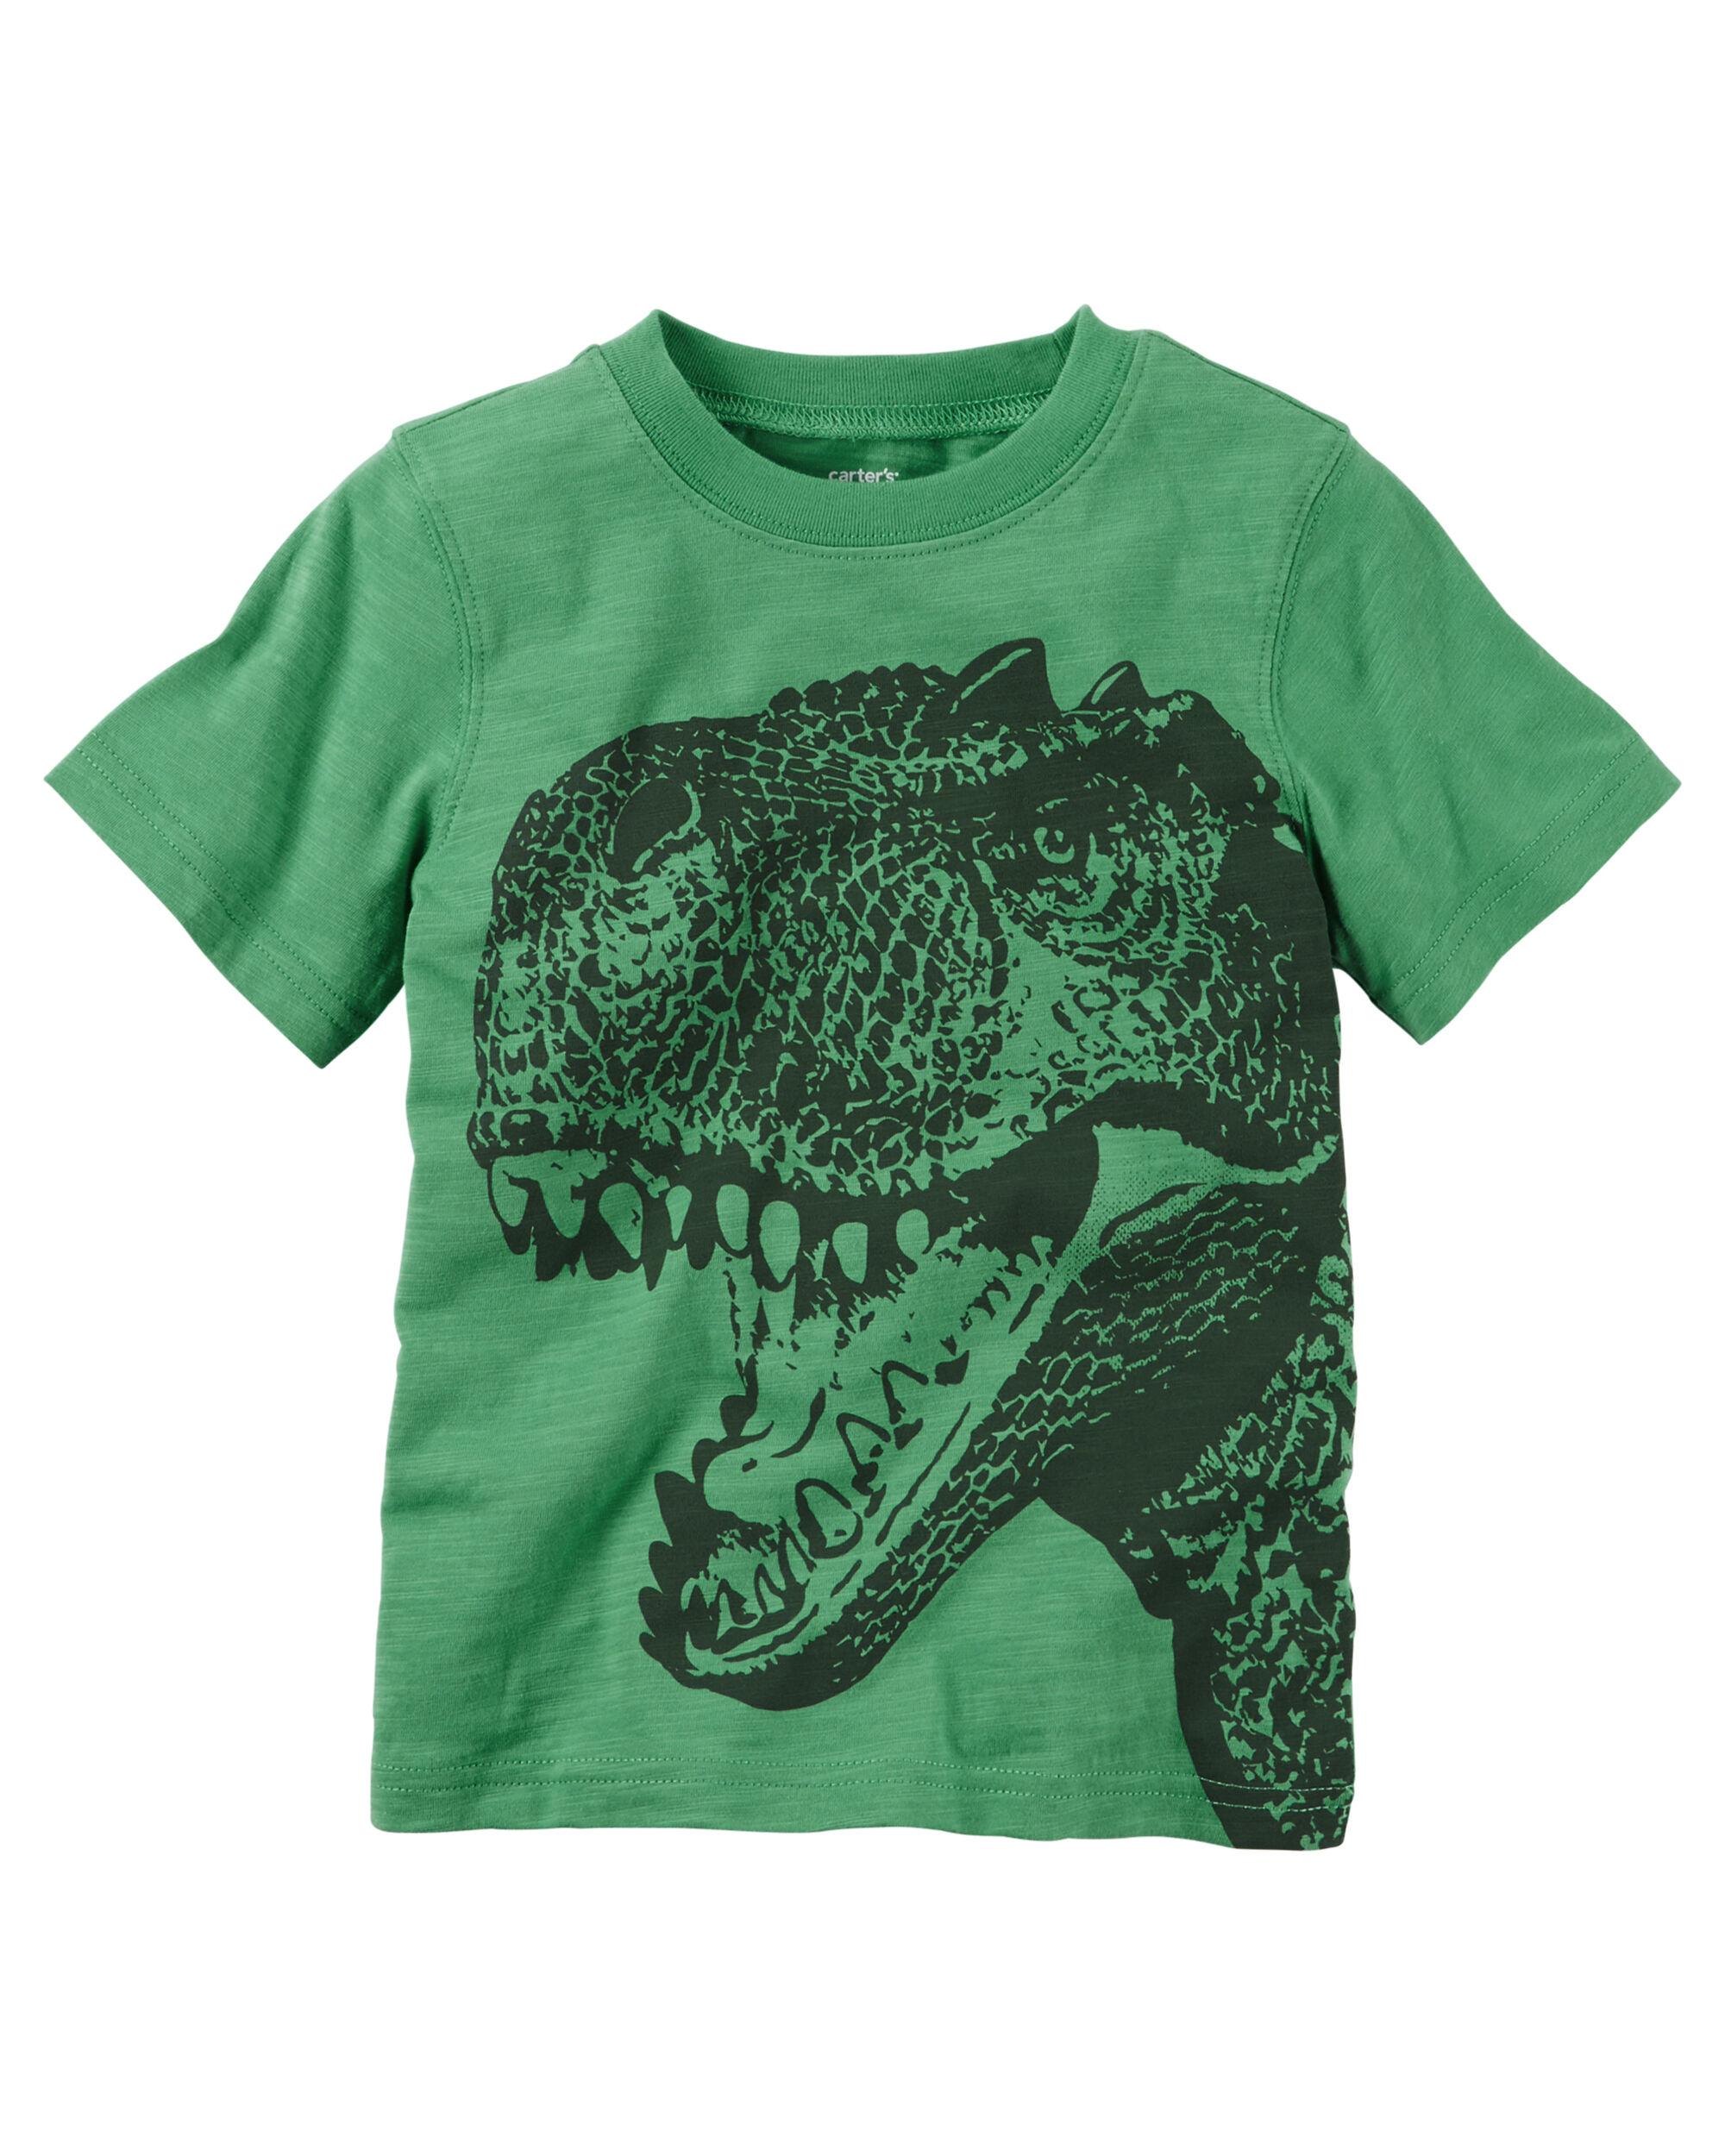 Dinosaur Tee | Carters.com